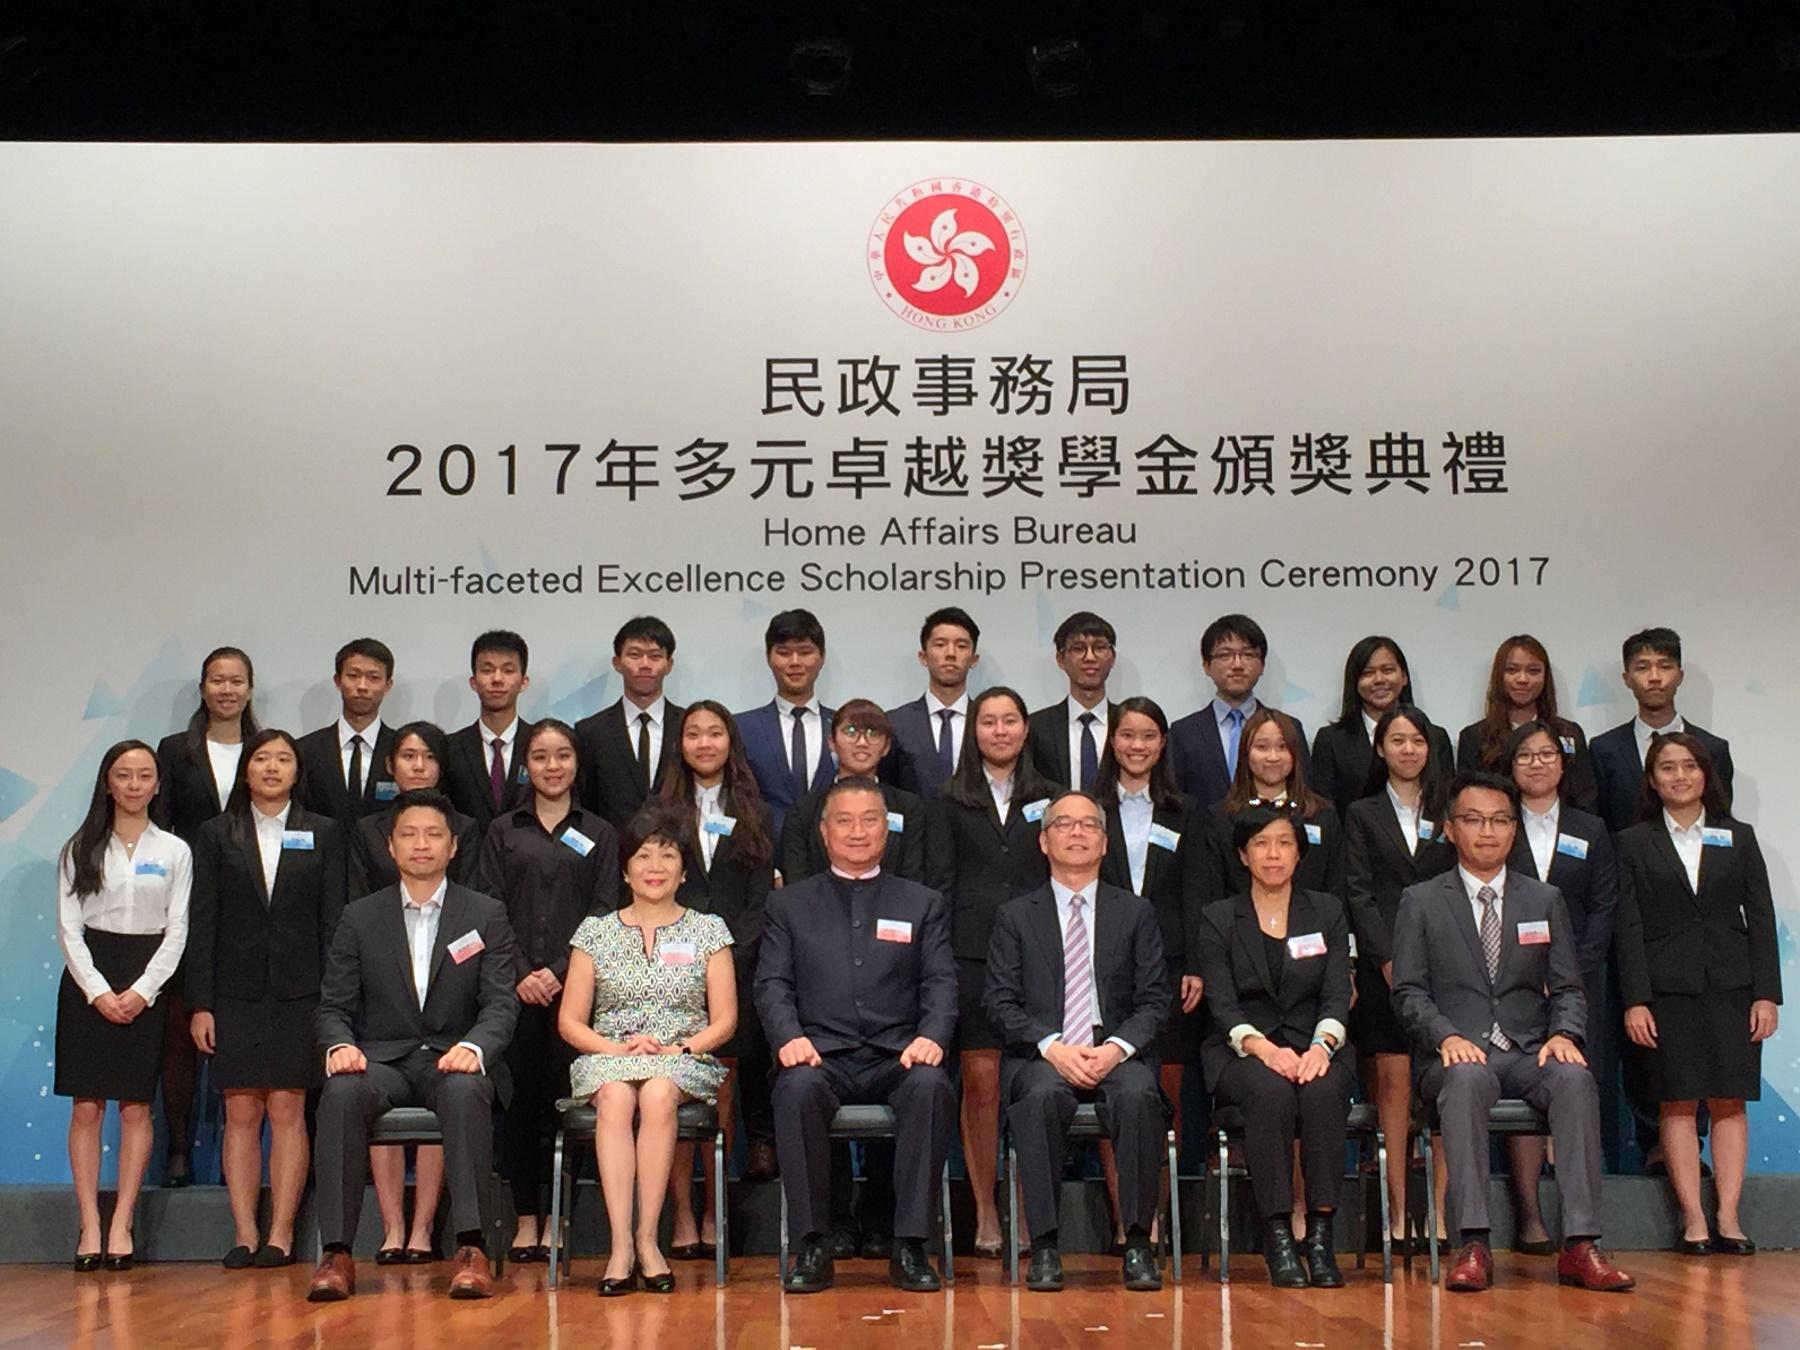 http://npc.edu.hk/sites/default/files/img_1667.jpg